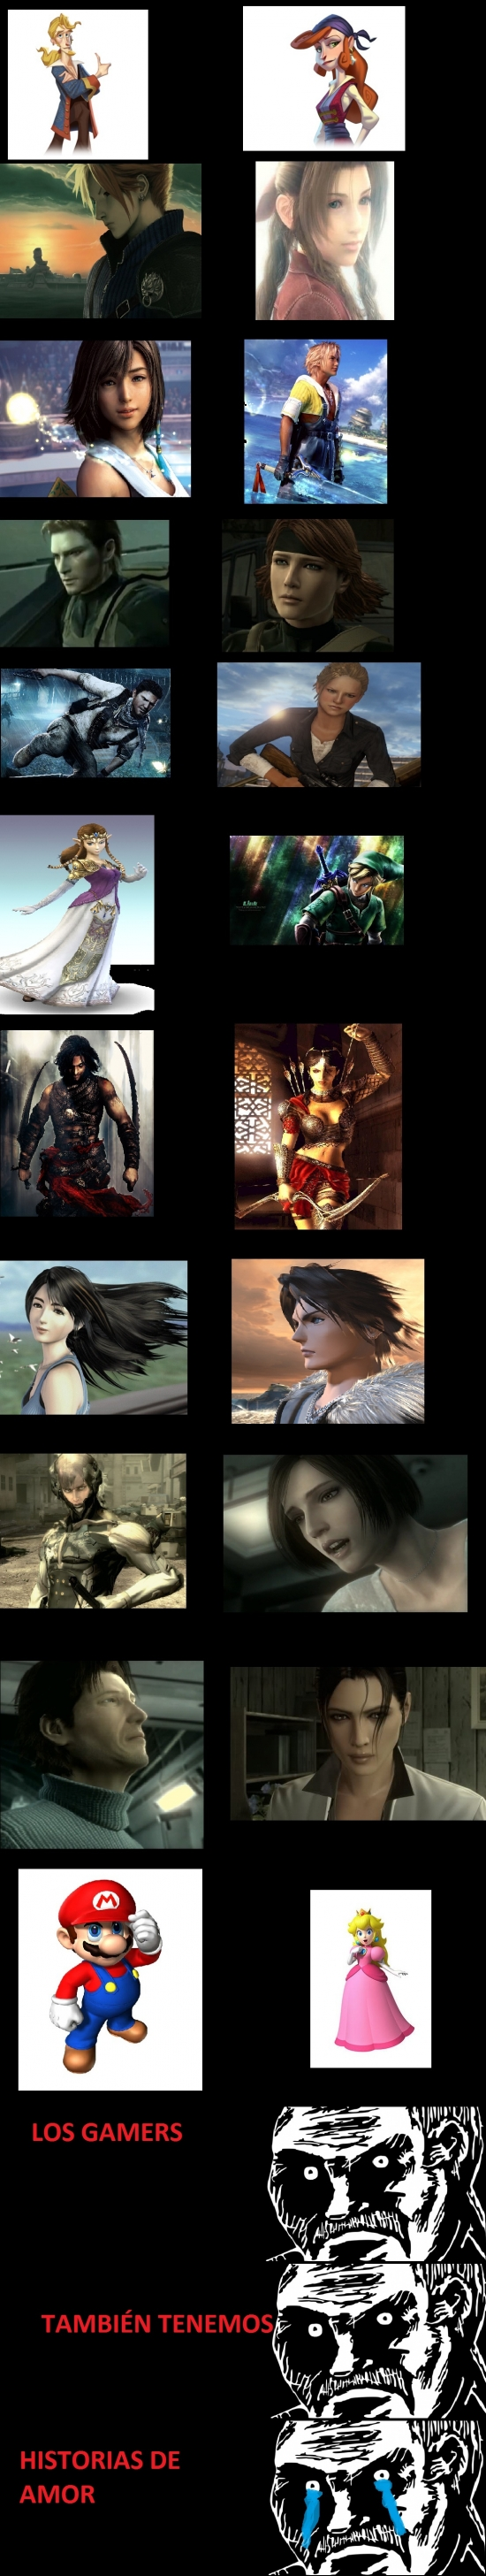 Mirada_fija - Amor en los videojuegos